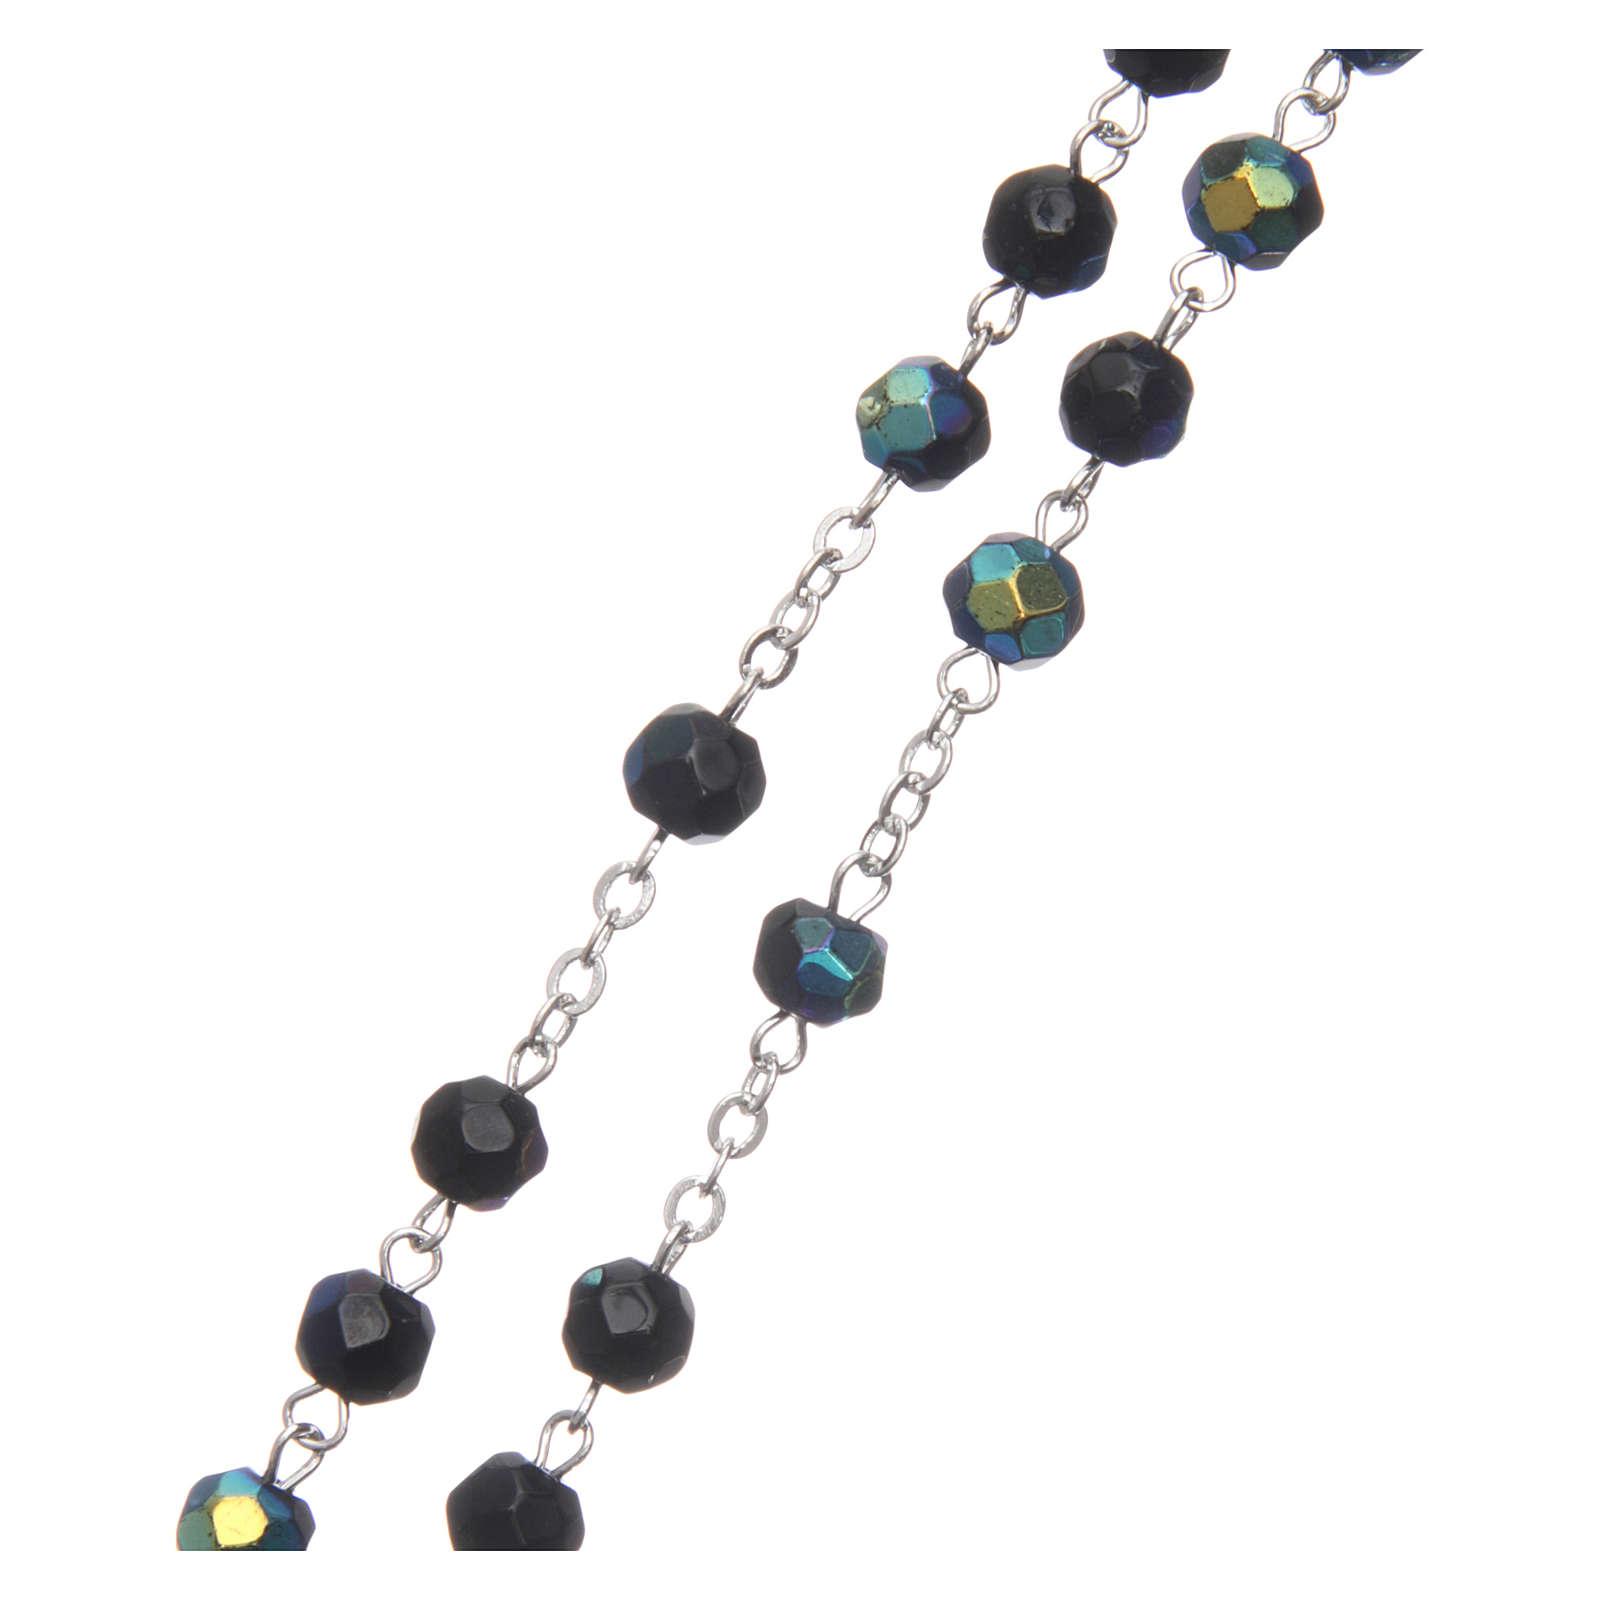 Chapelet semi-cristal noir iridescent 6 mm chaîne métal 4